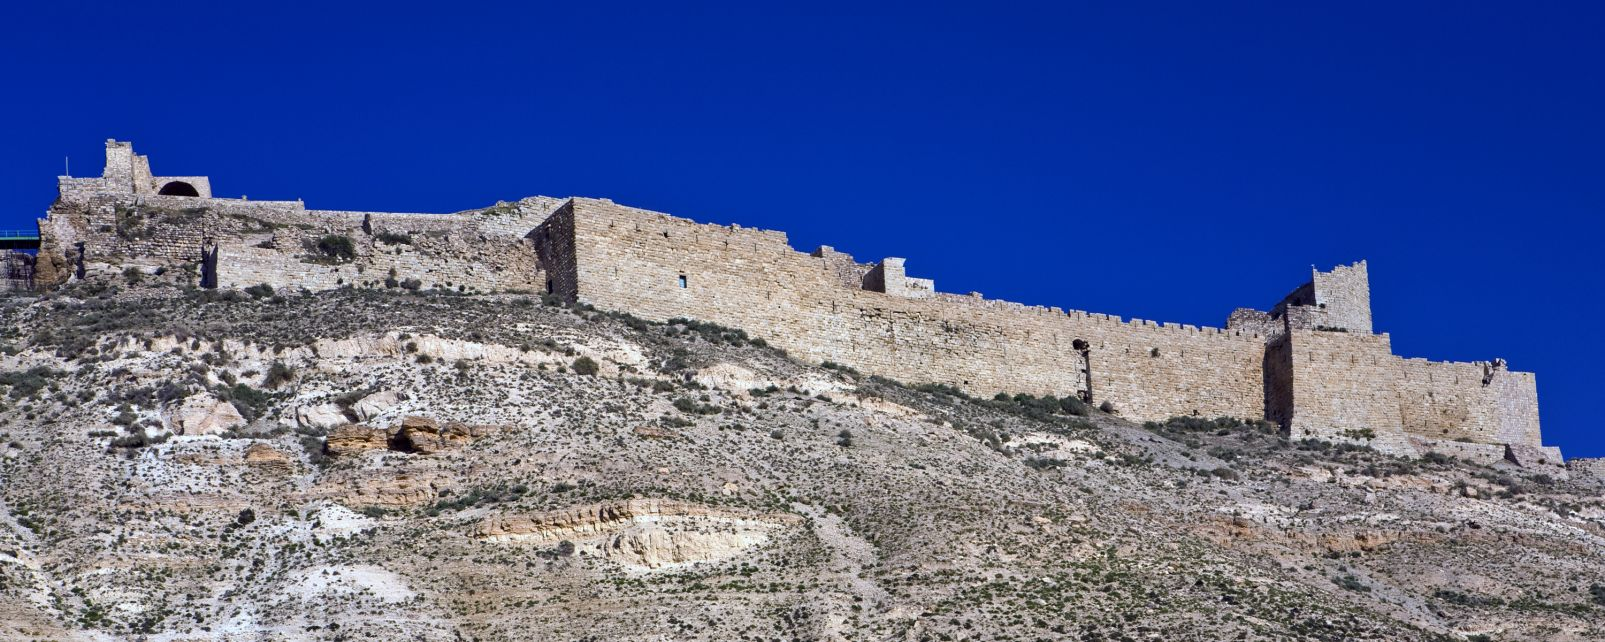 , Kérak, Los monumentos, Jordania